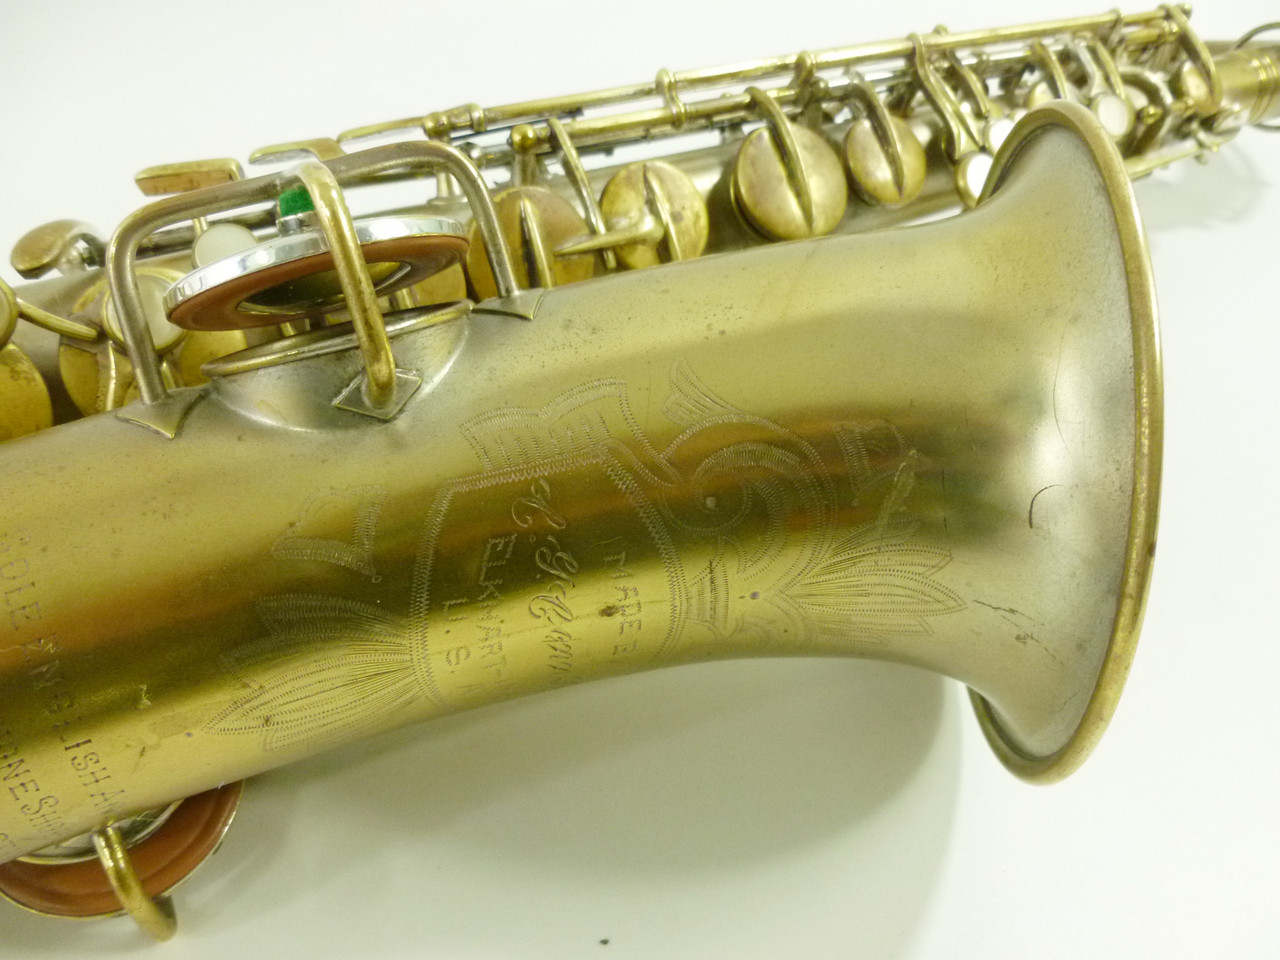 CONN NEW WONDER II (CHU BERRY) C. 1926 ALTO SAX - REFURBISHED 6